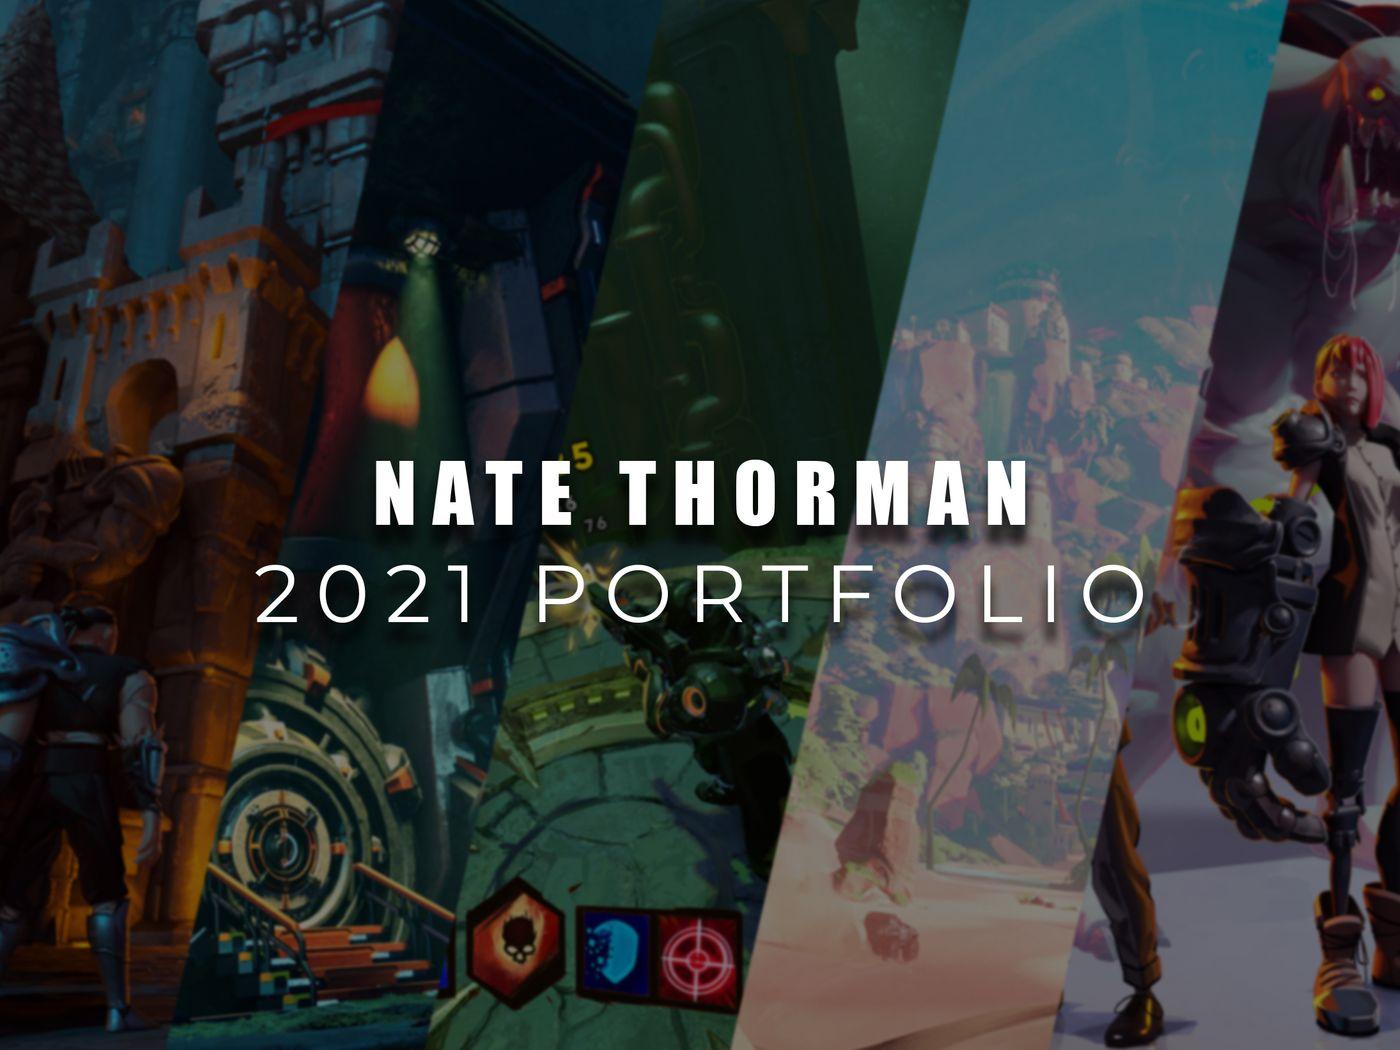 Nate Thorman - Concept Art Portfolio 2021